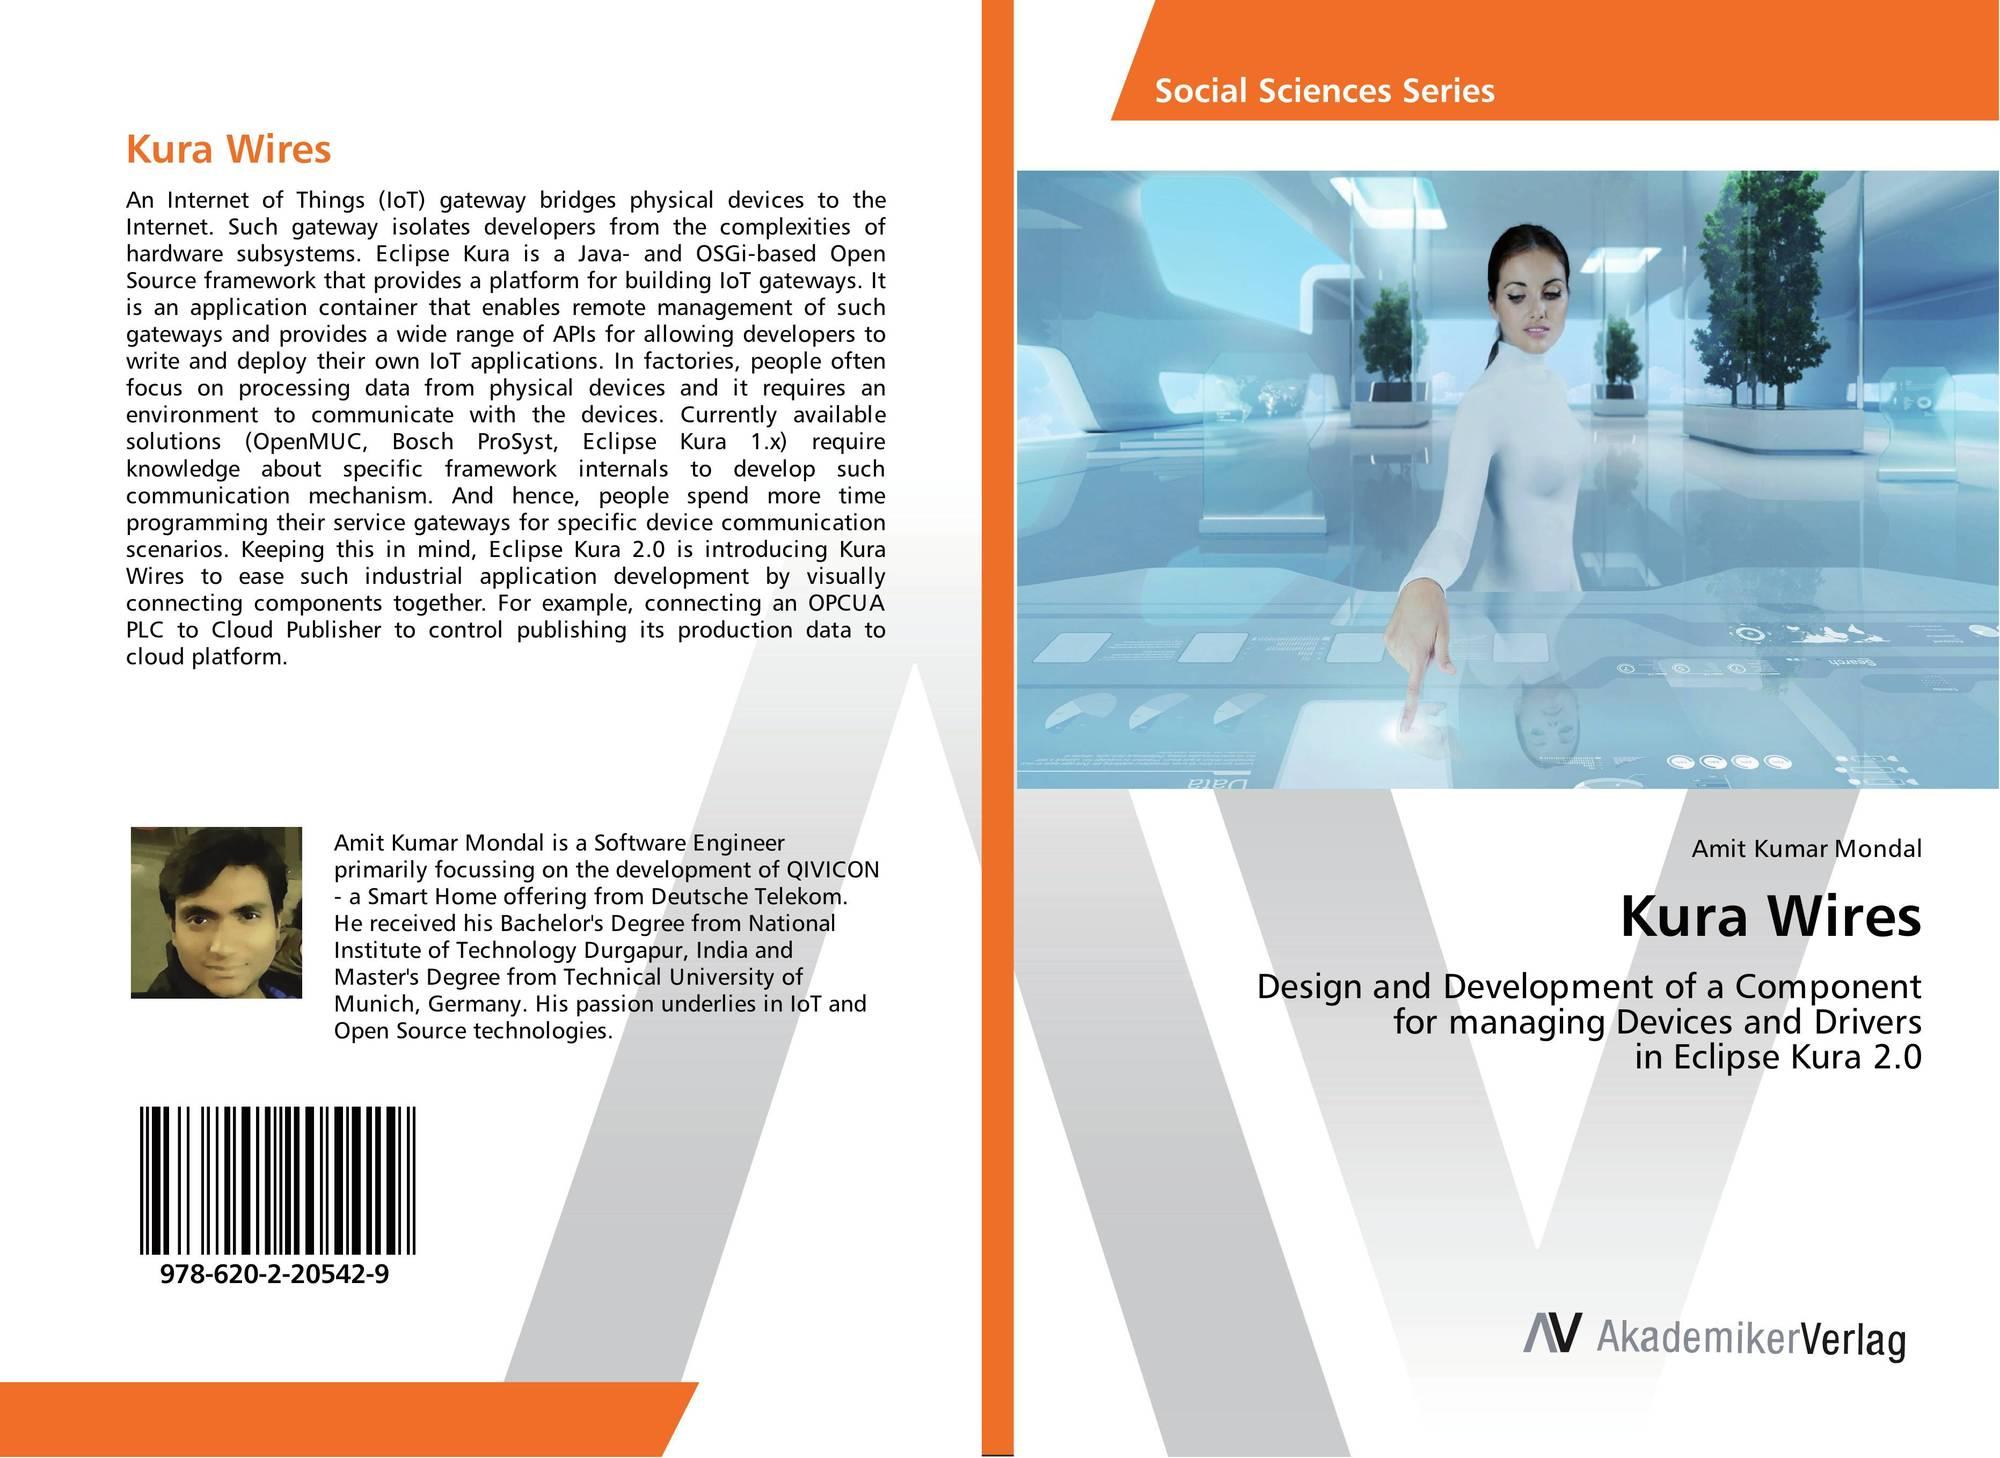 Kura Wires, 978-620-2-20542-9, 6202205423 ,9786202205429 by Amit ...